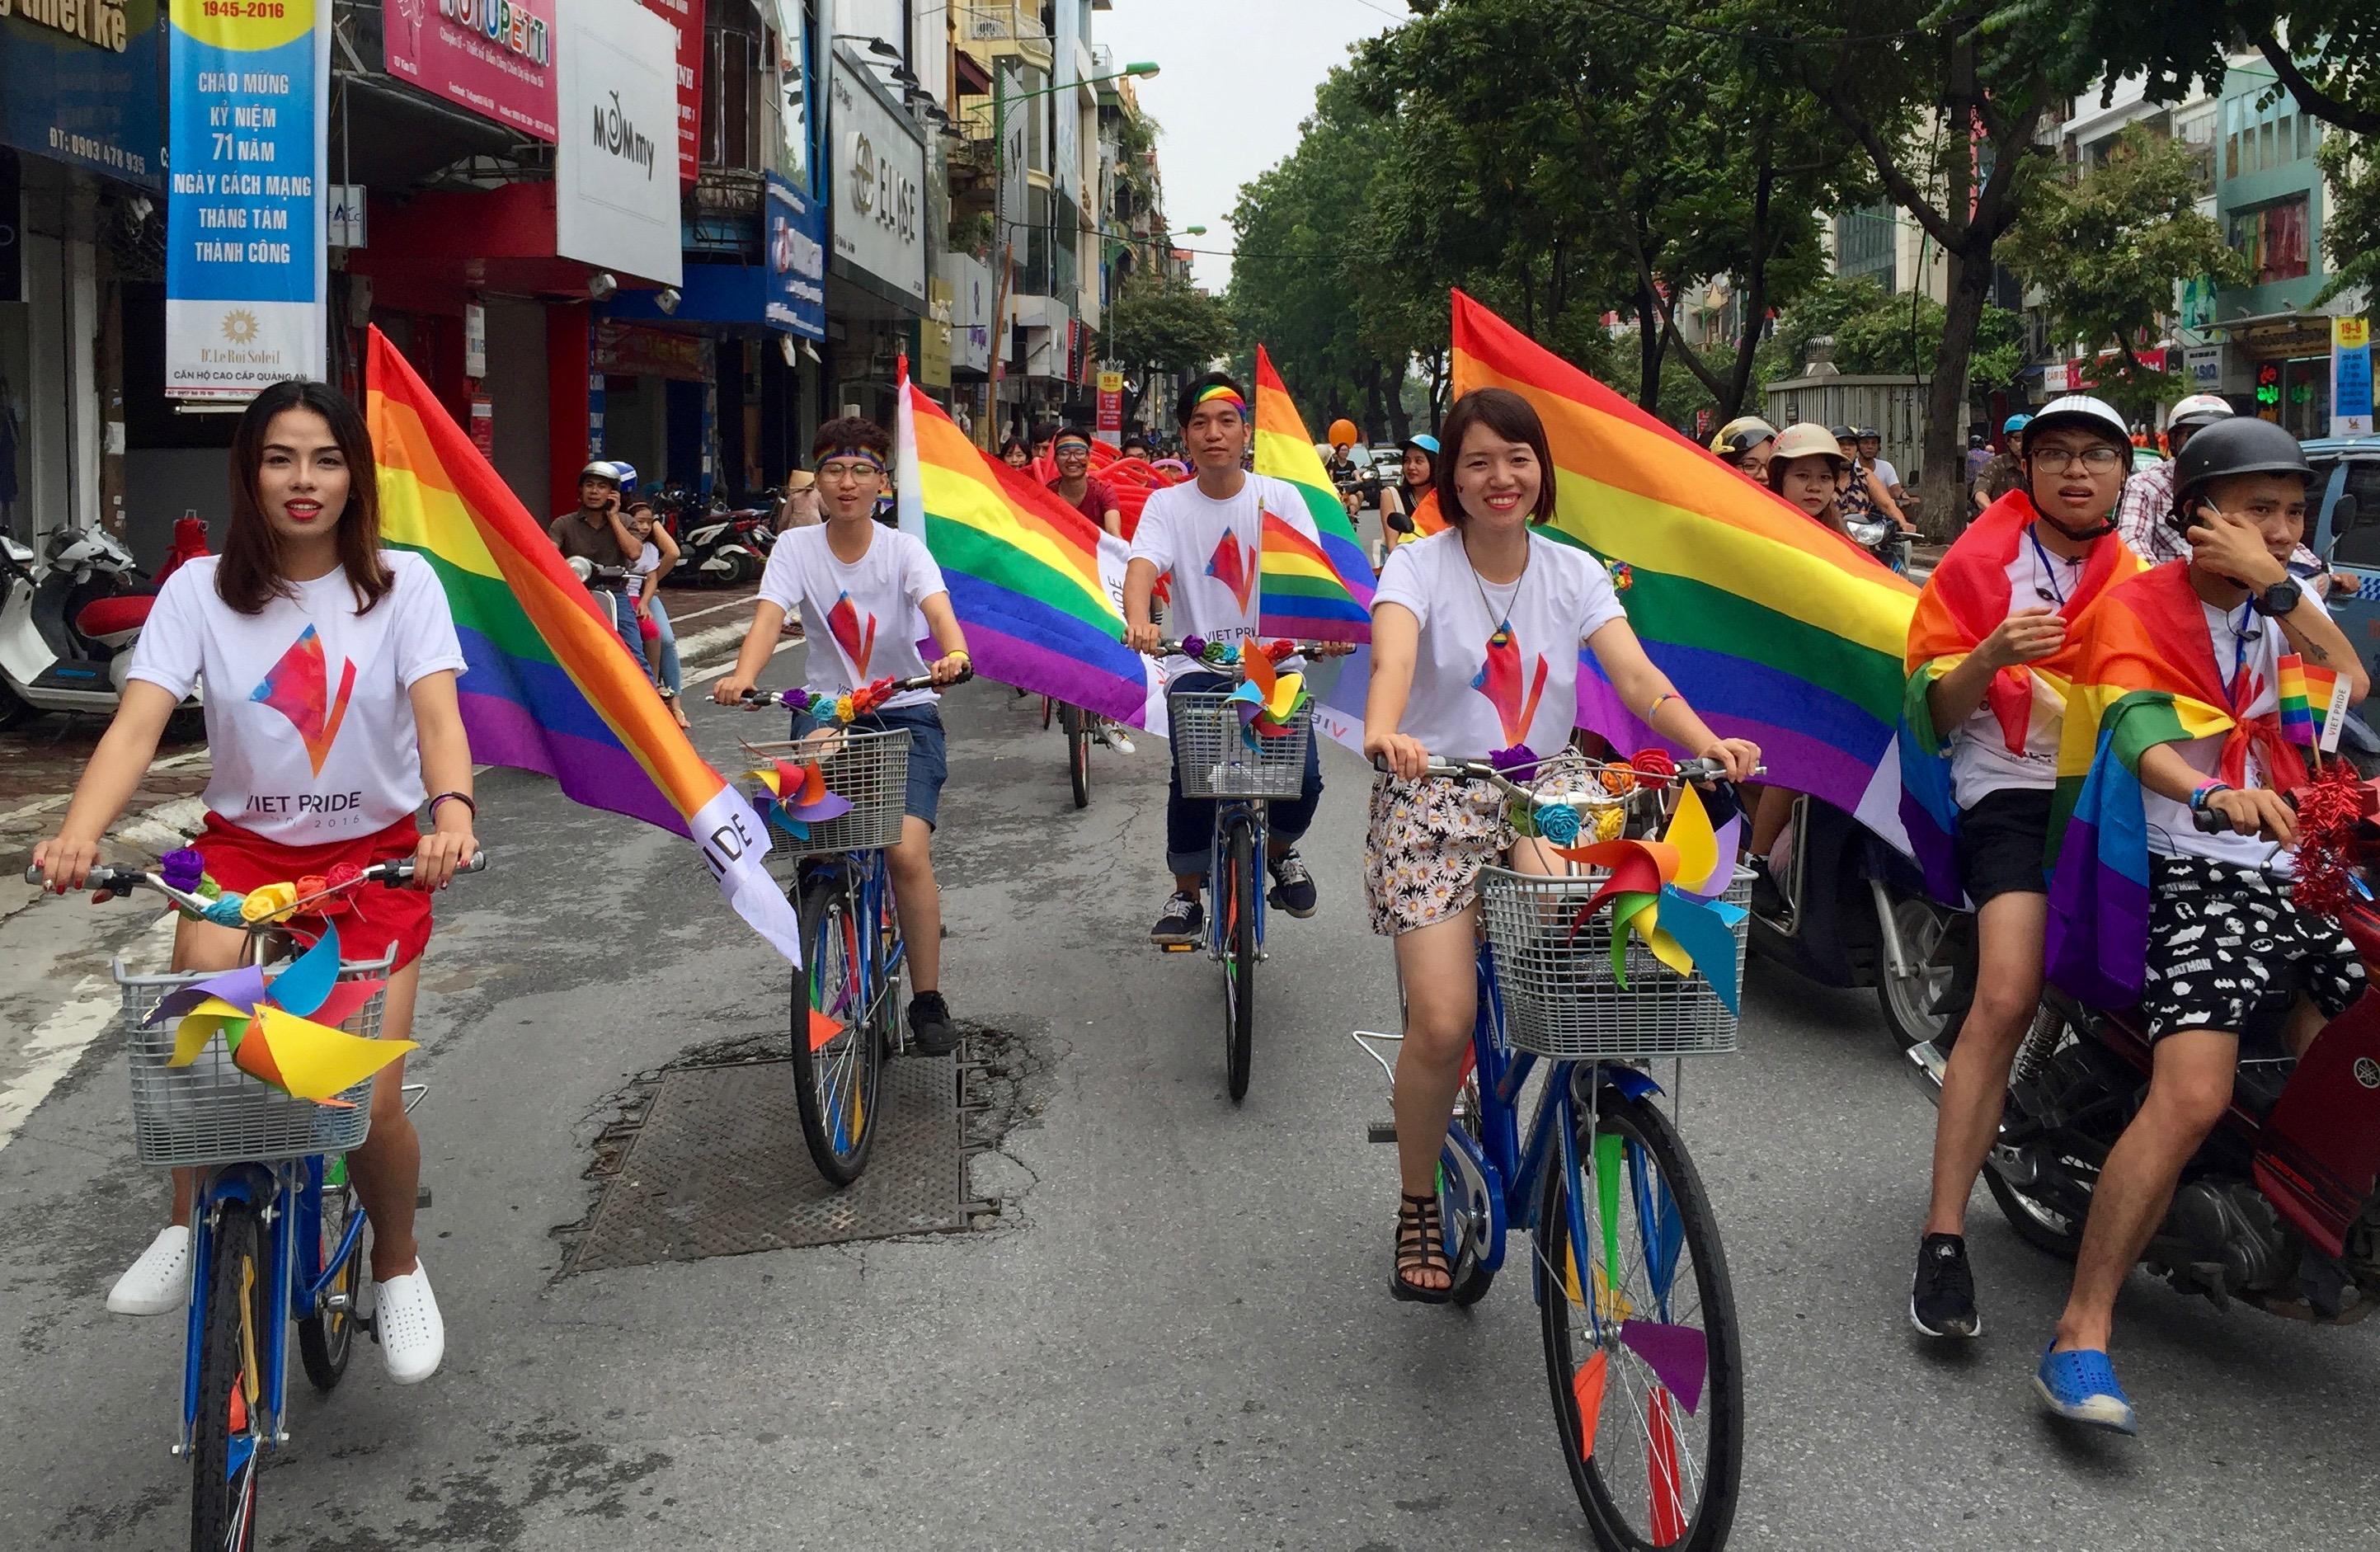 File:Viet Pride 2016 in Hanoi (29027661142).jpg - Wikimedia Commons